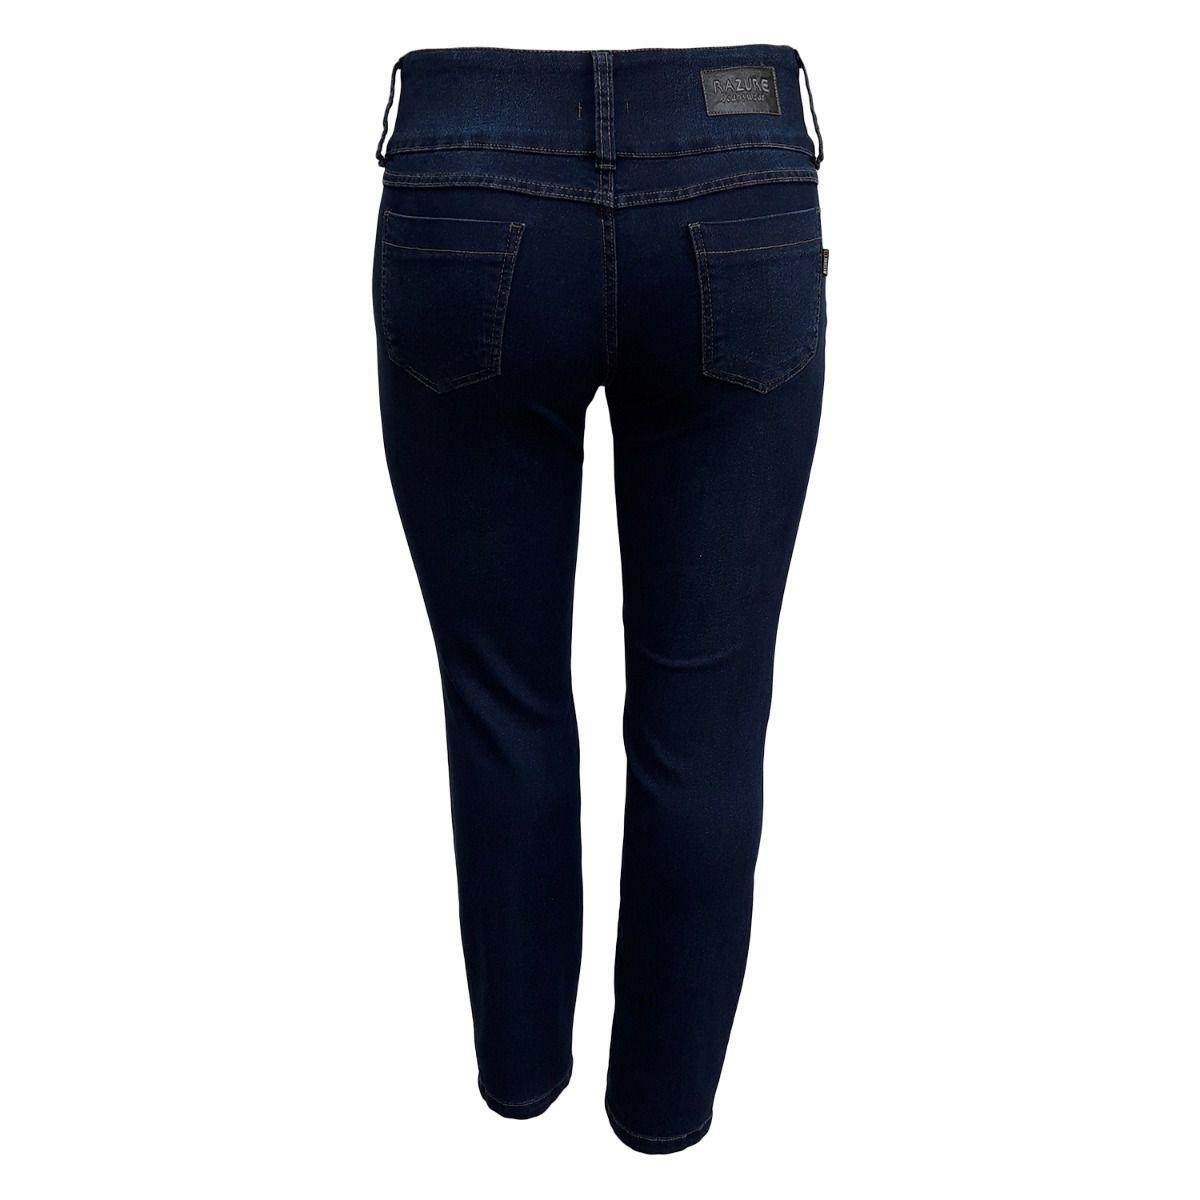 Calça Jeans Feminina Cós Largo Plus Size